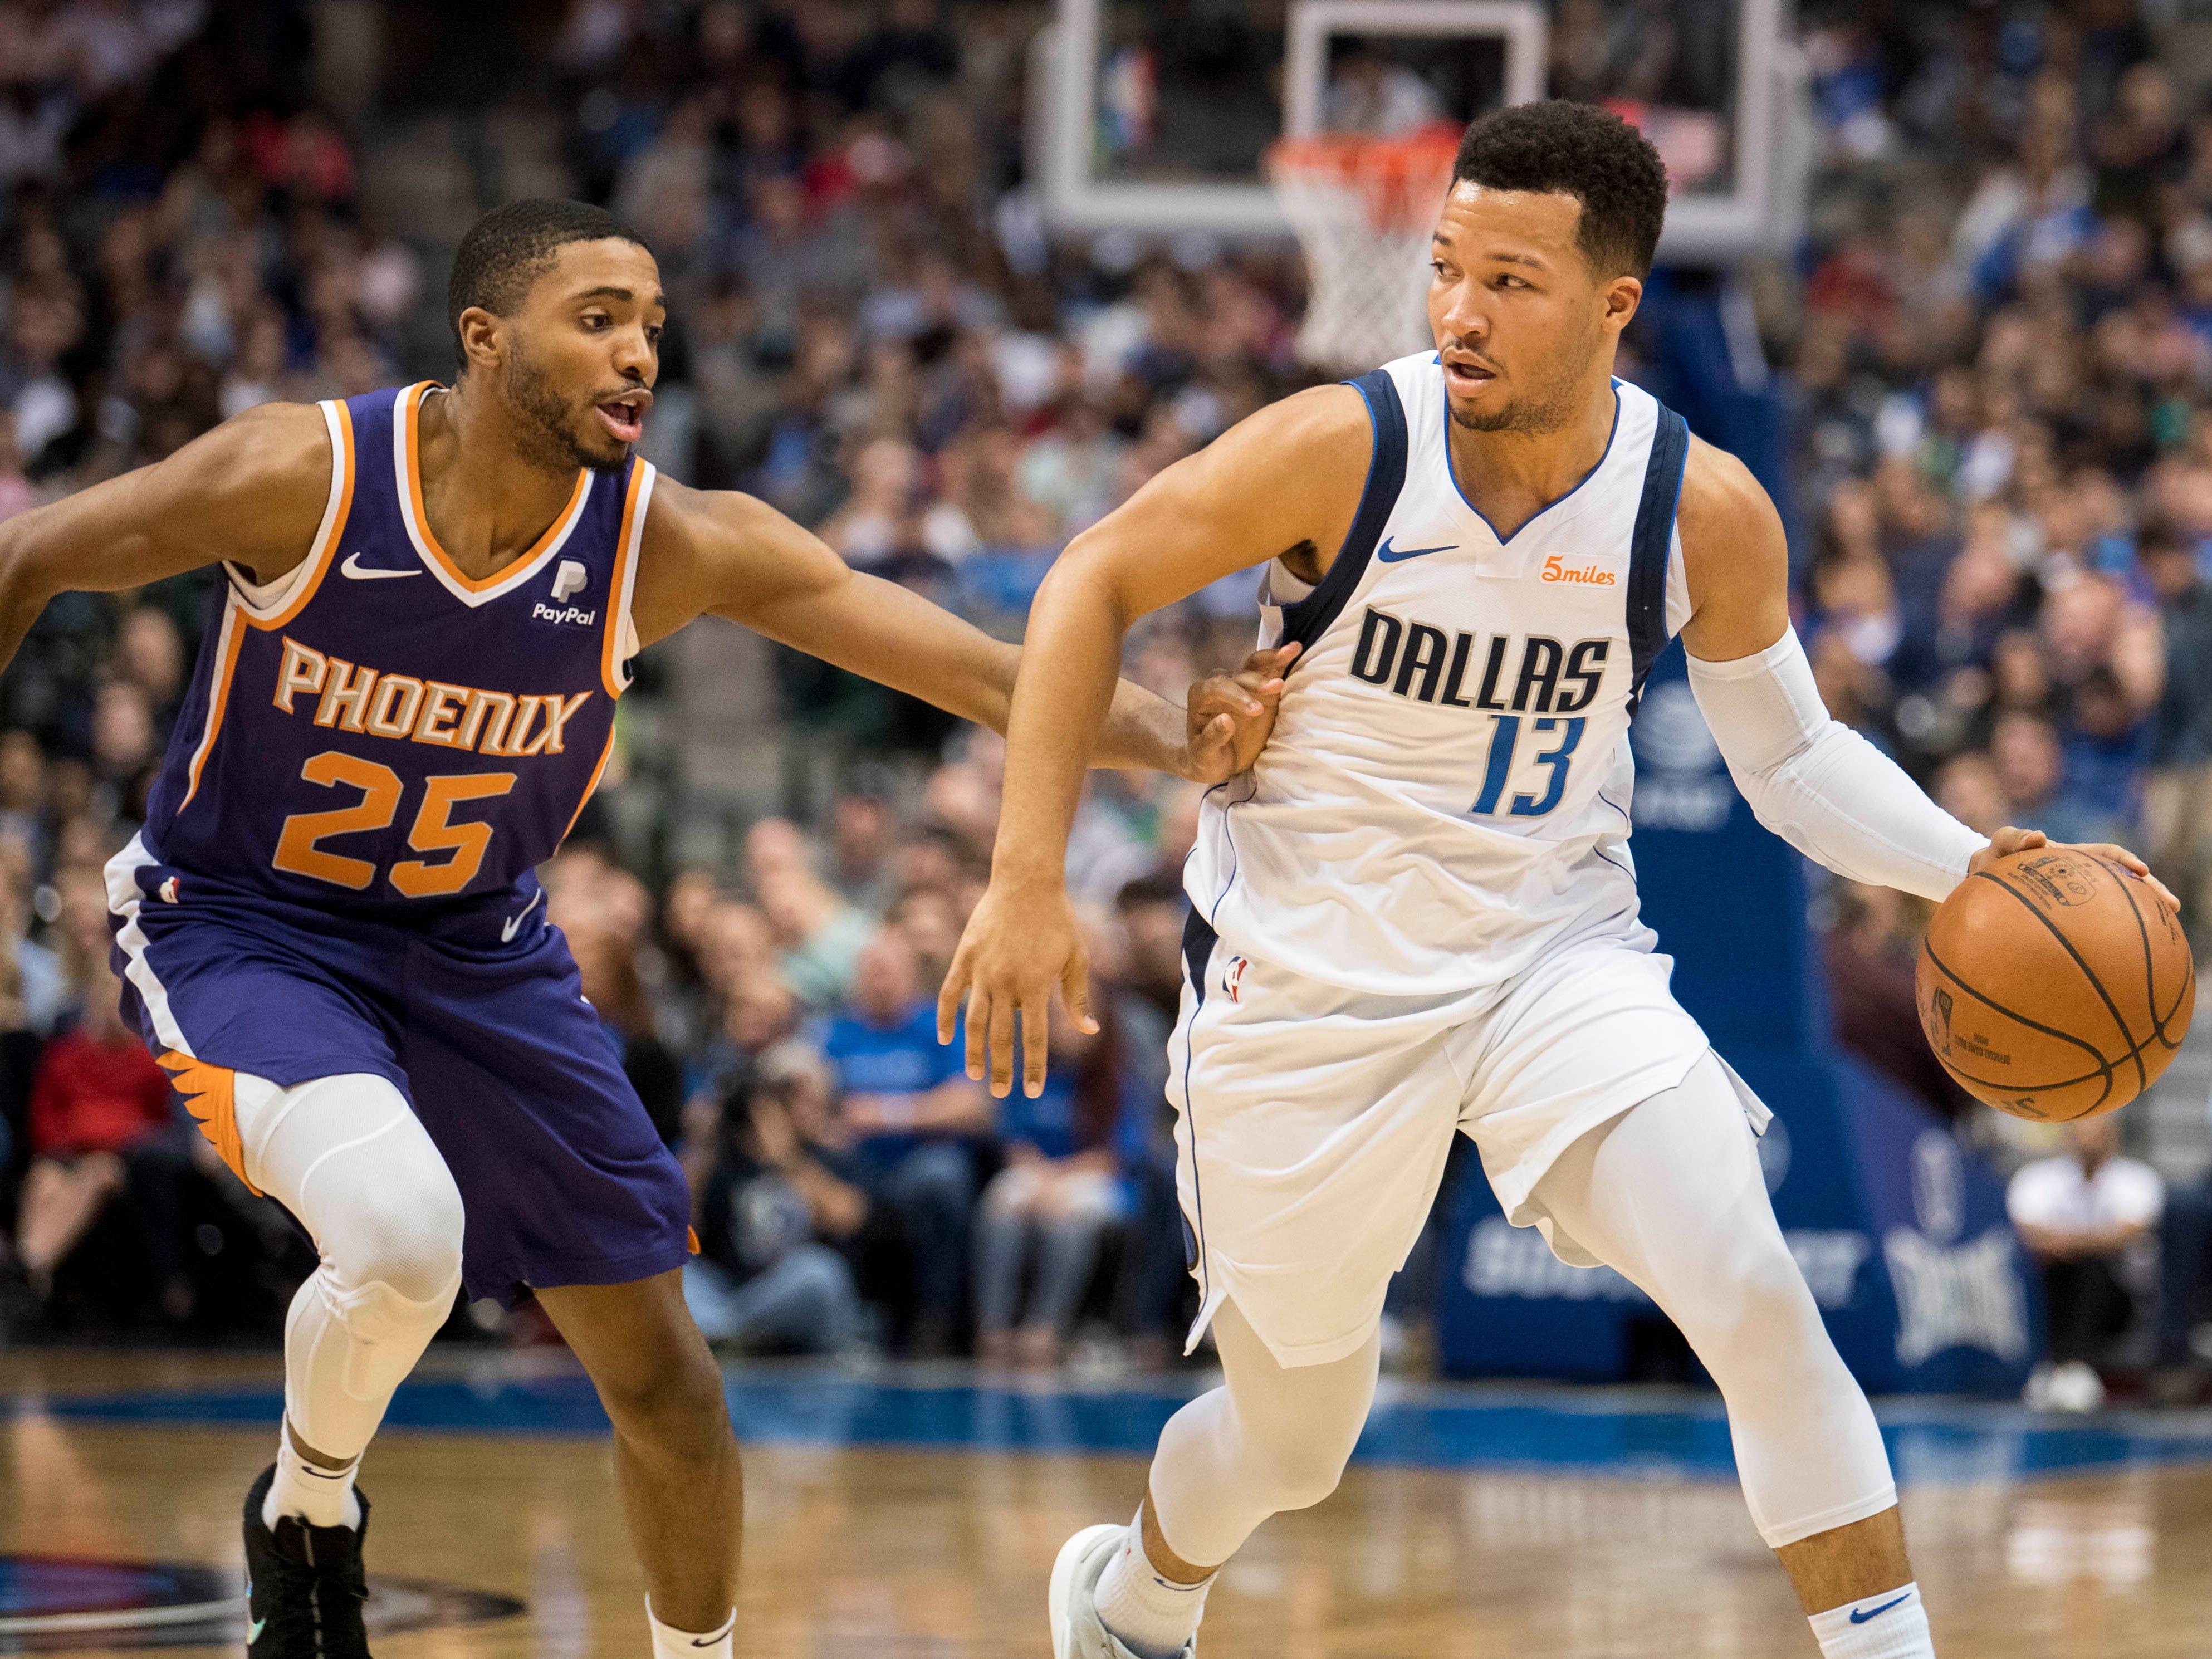 Jan 9, 2019; Dallas, TX, USA; Phoenix Suns forward Mikal Bridges (25) guards Dallas Mavericks guard Jalen Brunson (13) during the second quarter at the American Airlines Center. Mandatory Credit: Jerome Miron-USA TODAY Sports